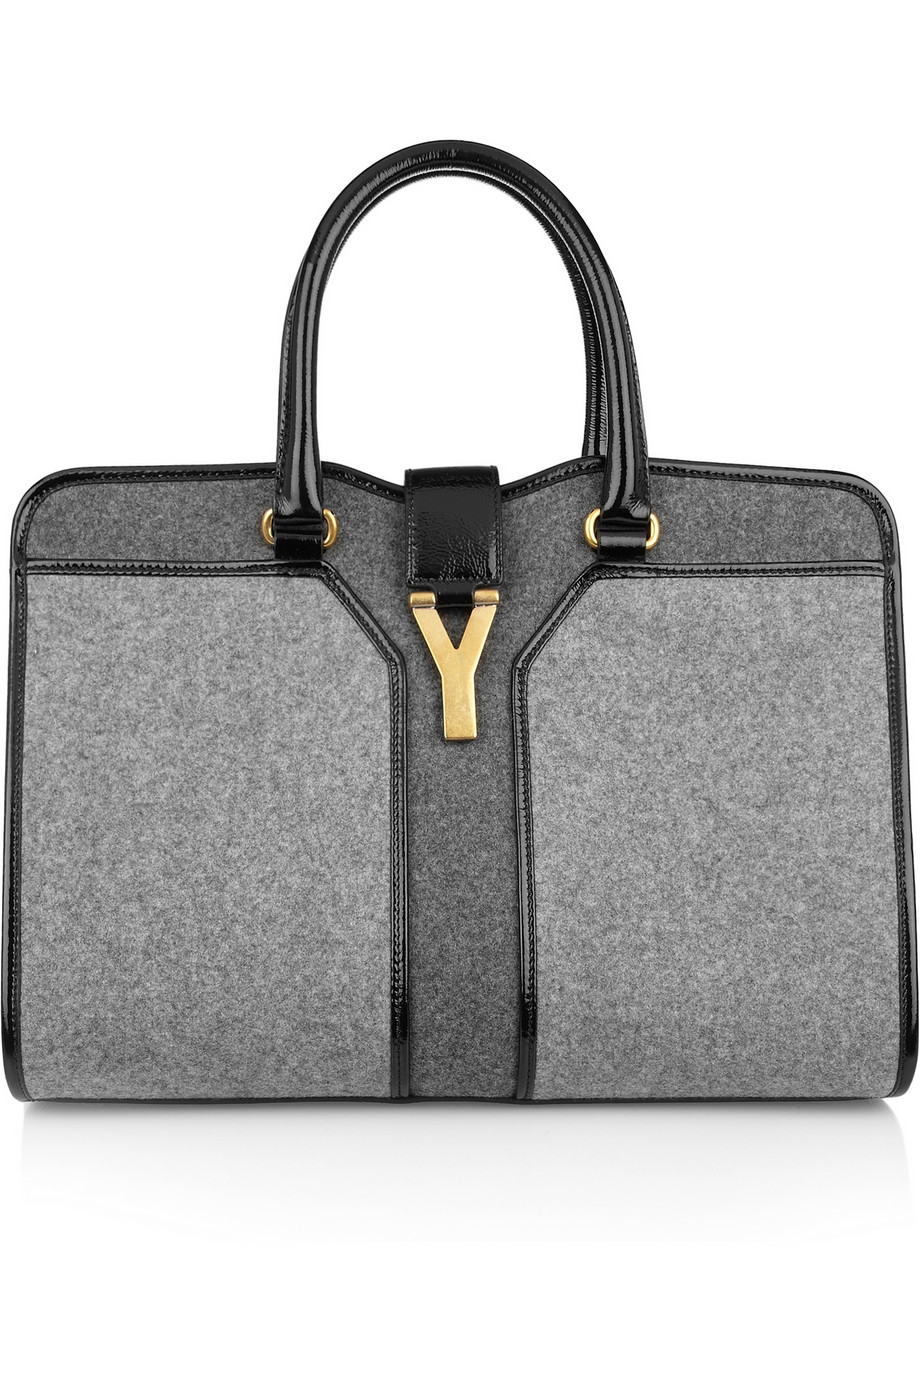 Lyst - Saint Laurent Cabas Chyc Medium Woolfelt and Patent Leather ... a28d8a1f99